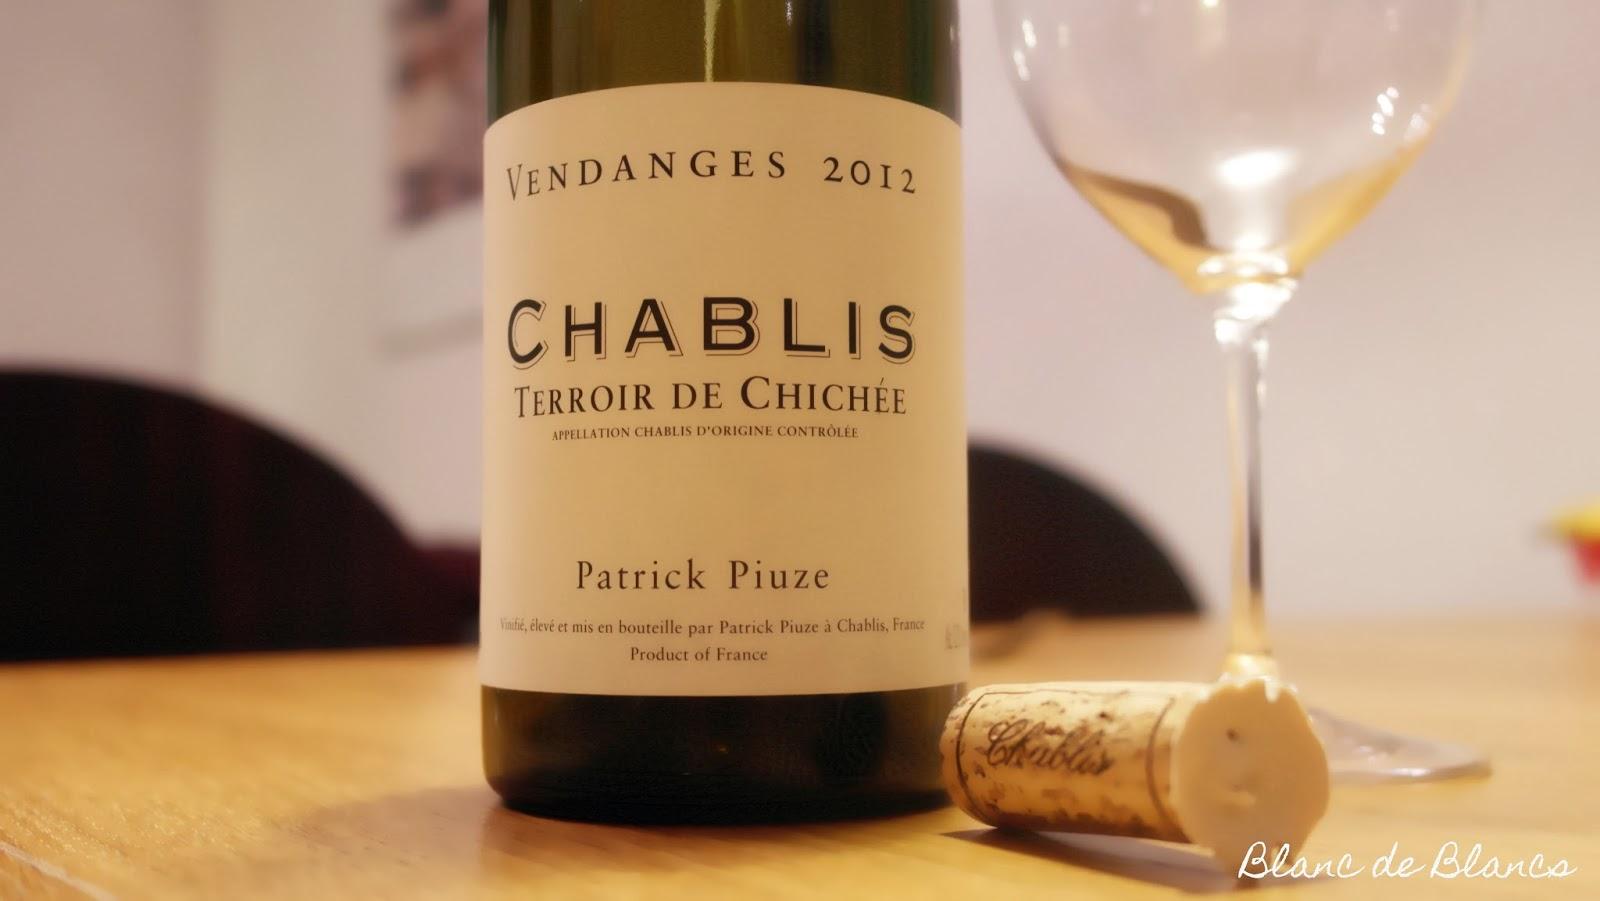 Patrick Piuze Terroirs de Chichée - www.blancdeblancs.fi